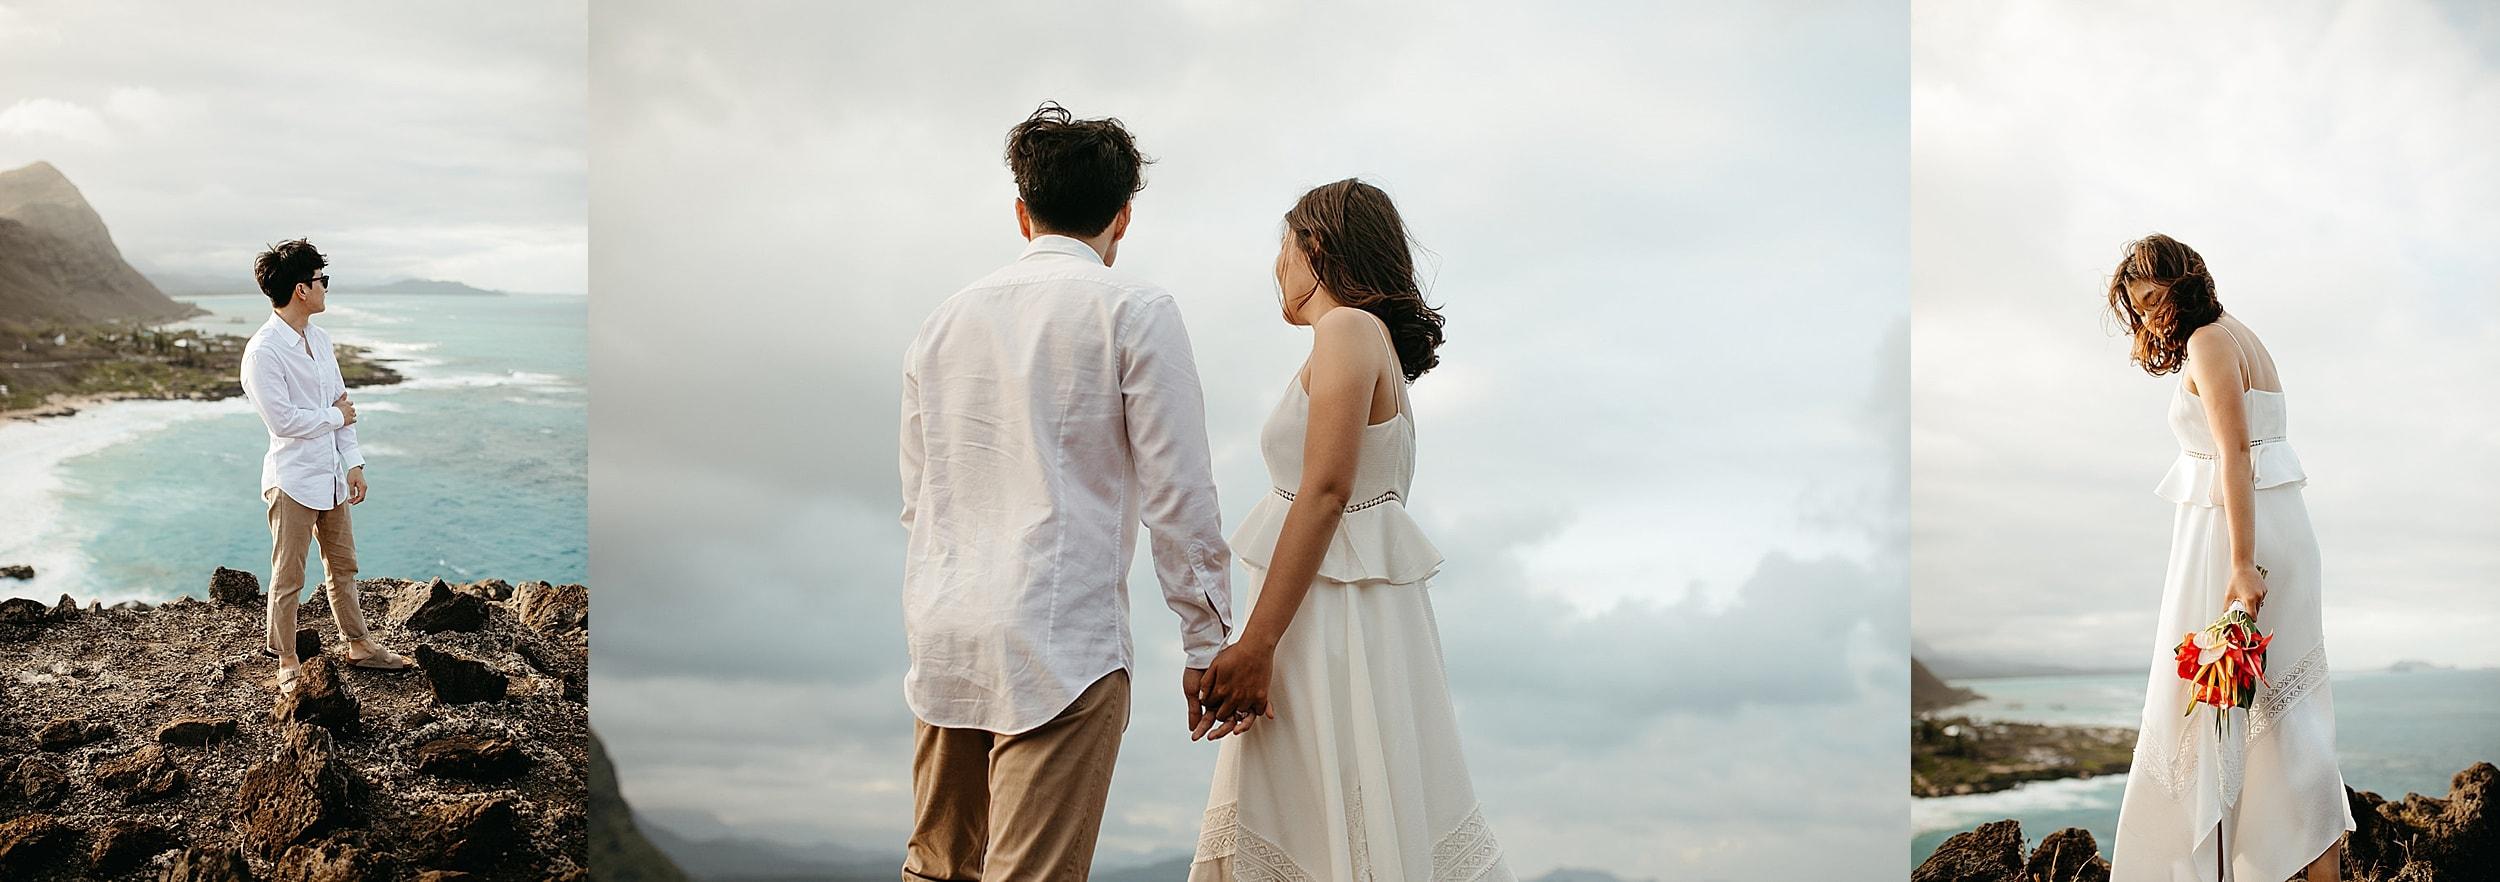 hawaii elopement in Oahu